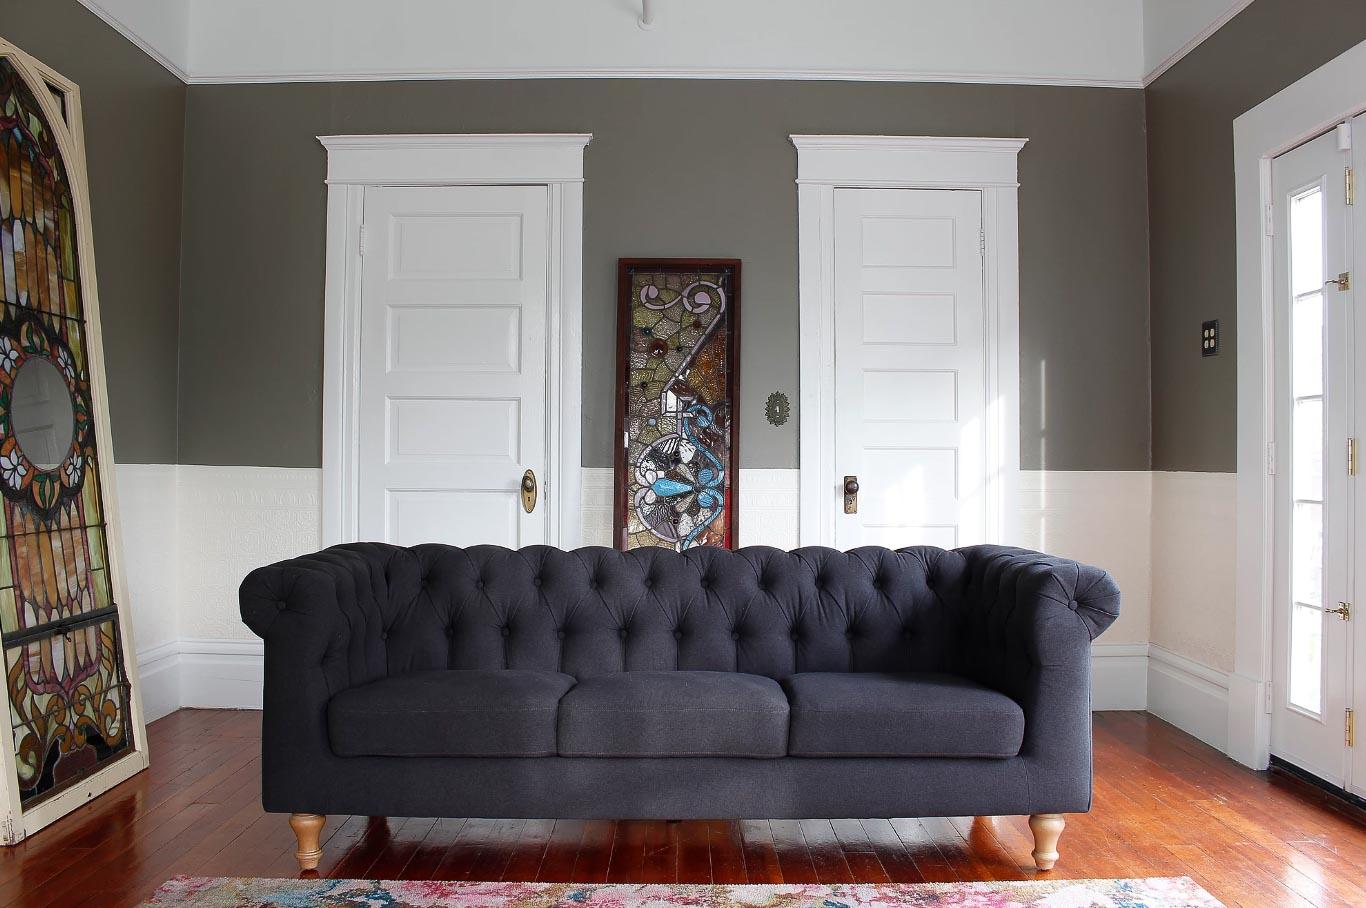 Petaluma-Place-natural-light-photography-studio-lifestyle-photo-ideas-indoor-photoshoot-location-19.jpg